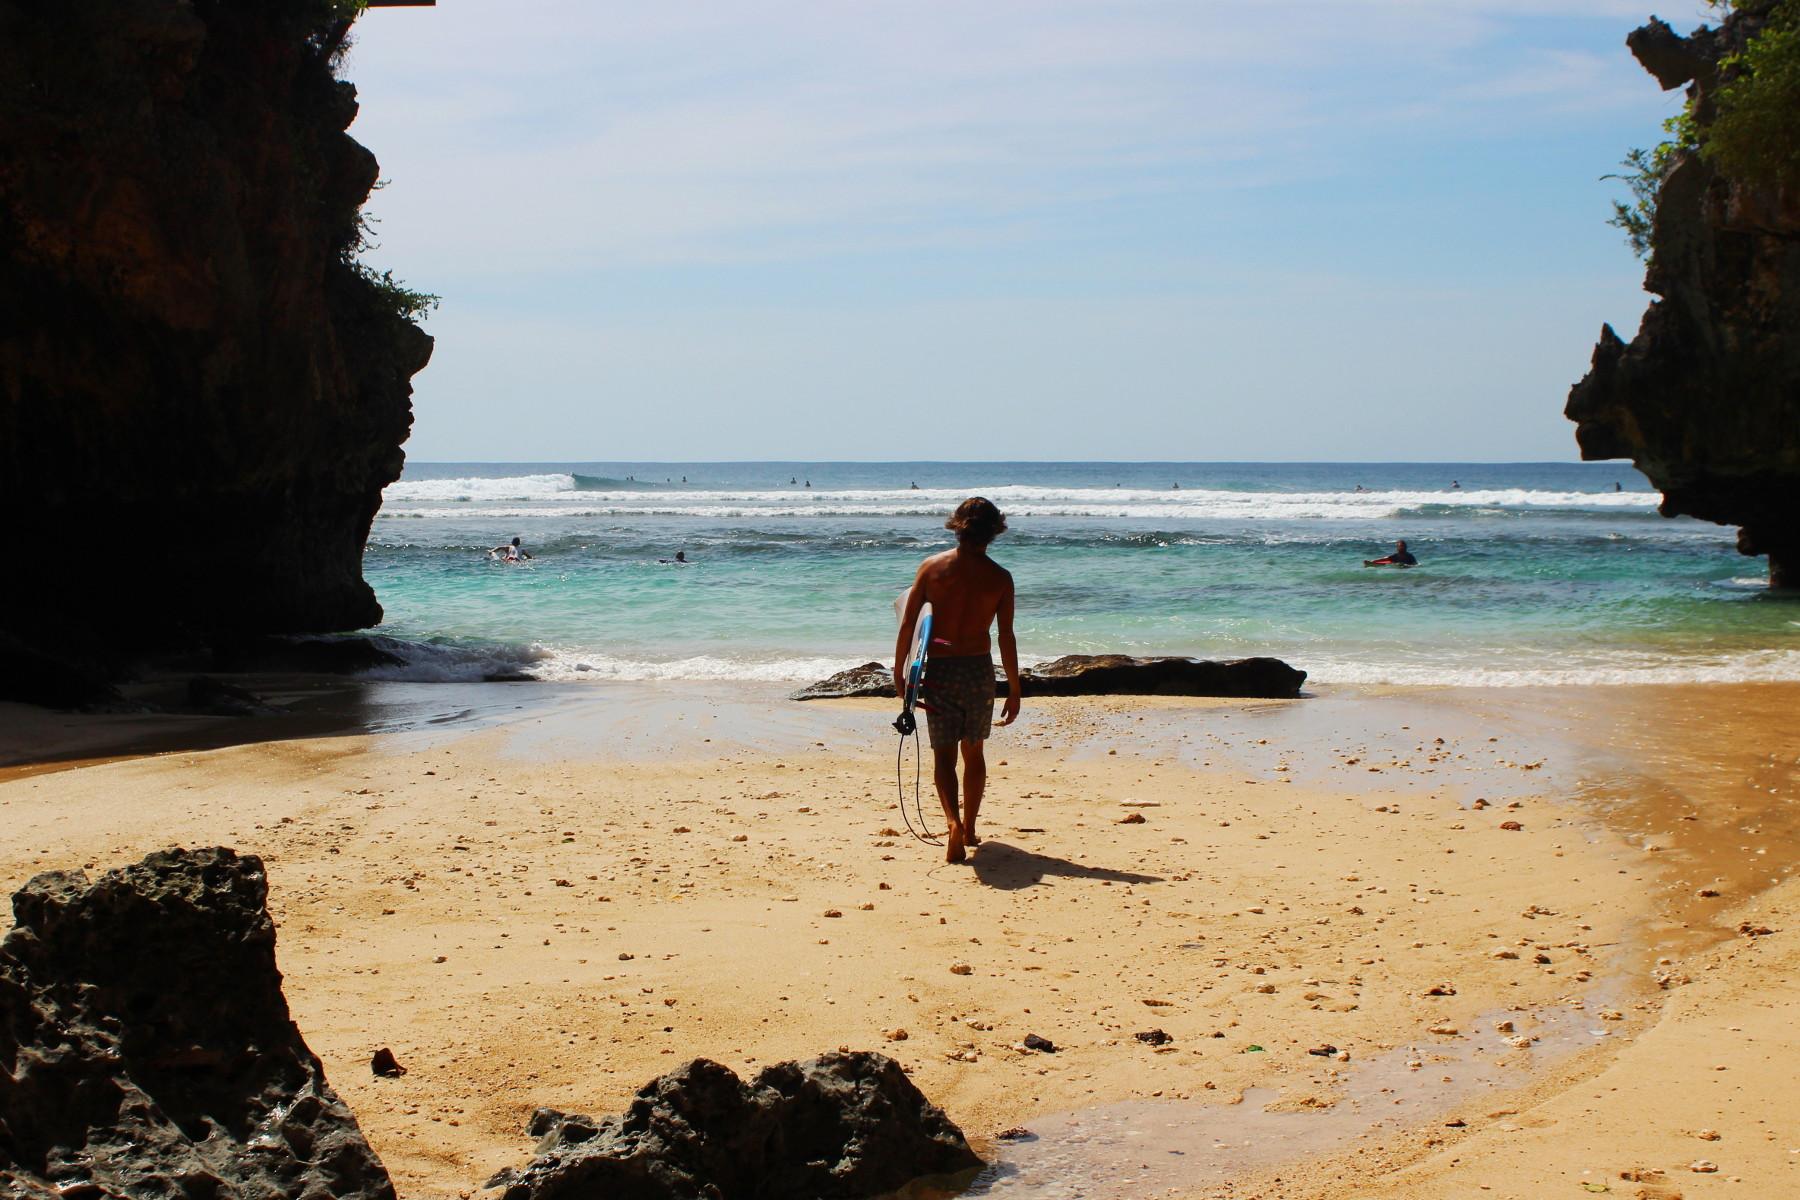 Surfer entering the sea